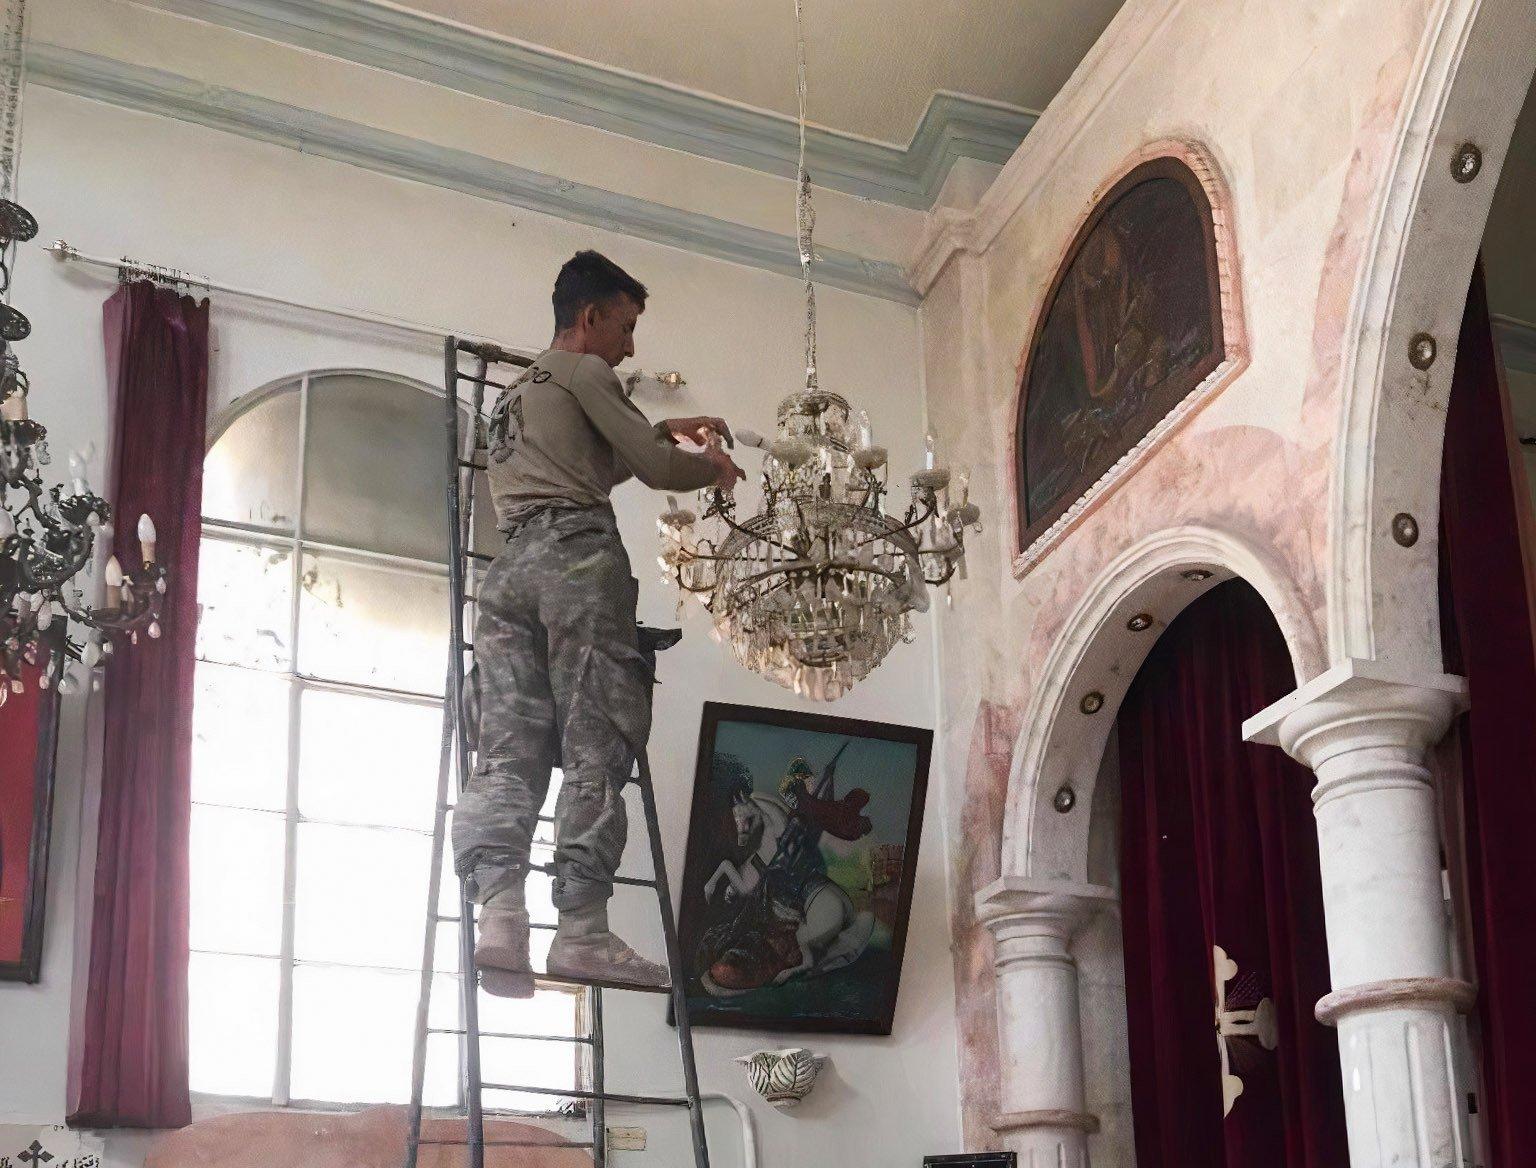 A Turkish soldier installs lightbulbs on a chandelier inside the Syriac Orthodox Church in Syria's Ras al-Ain, July 14, 2021. (Defense Ministry Handout)